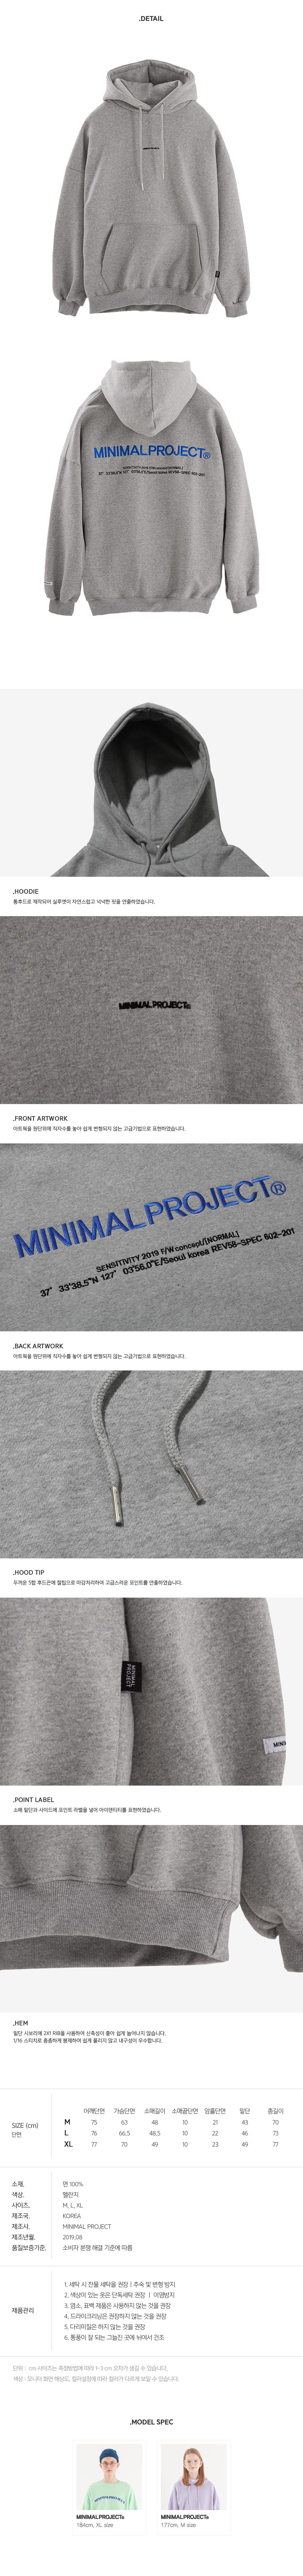 [minimal project] 미니멀프로젝트 포지션 넘버 폰트 오버핏 후드 MHT106 [MELANGE]